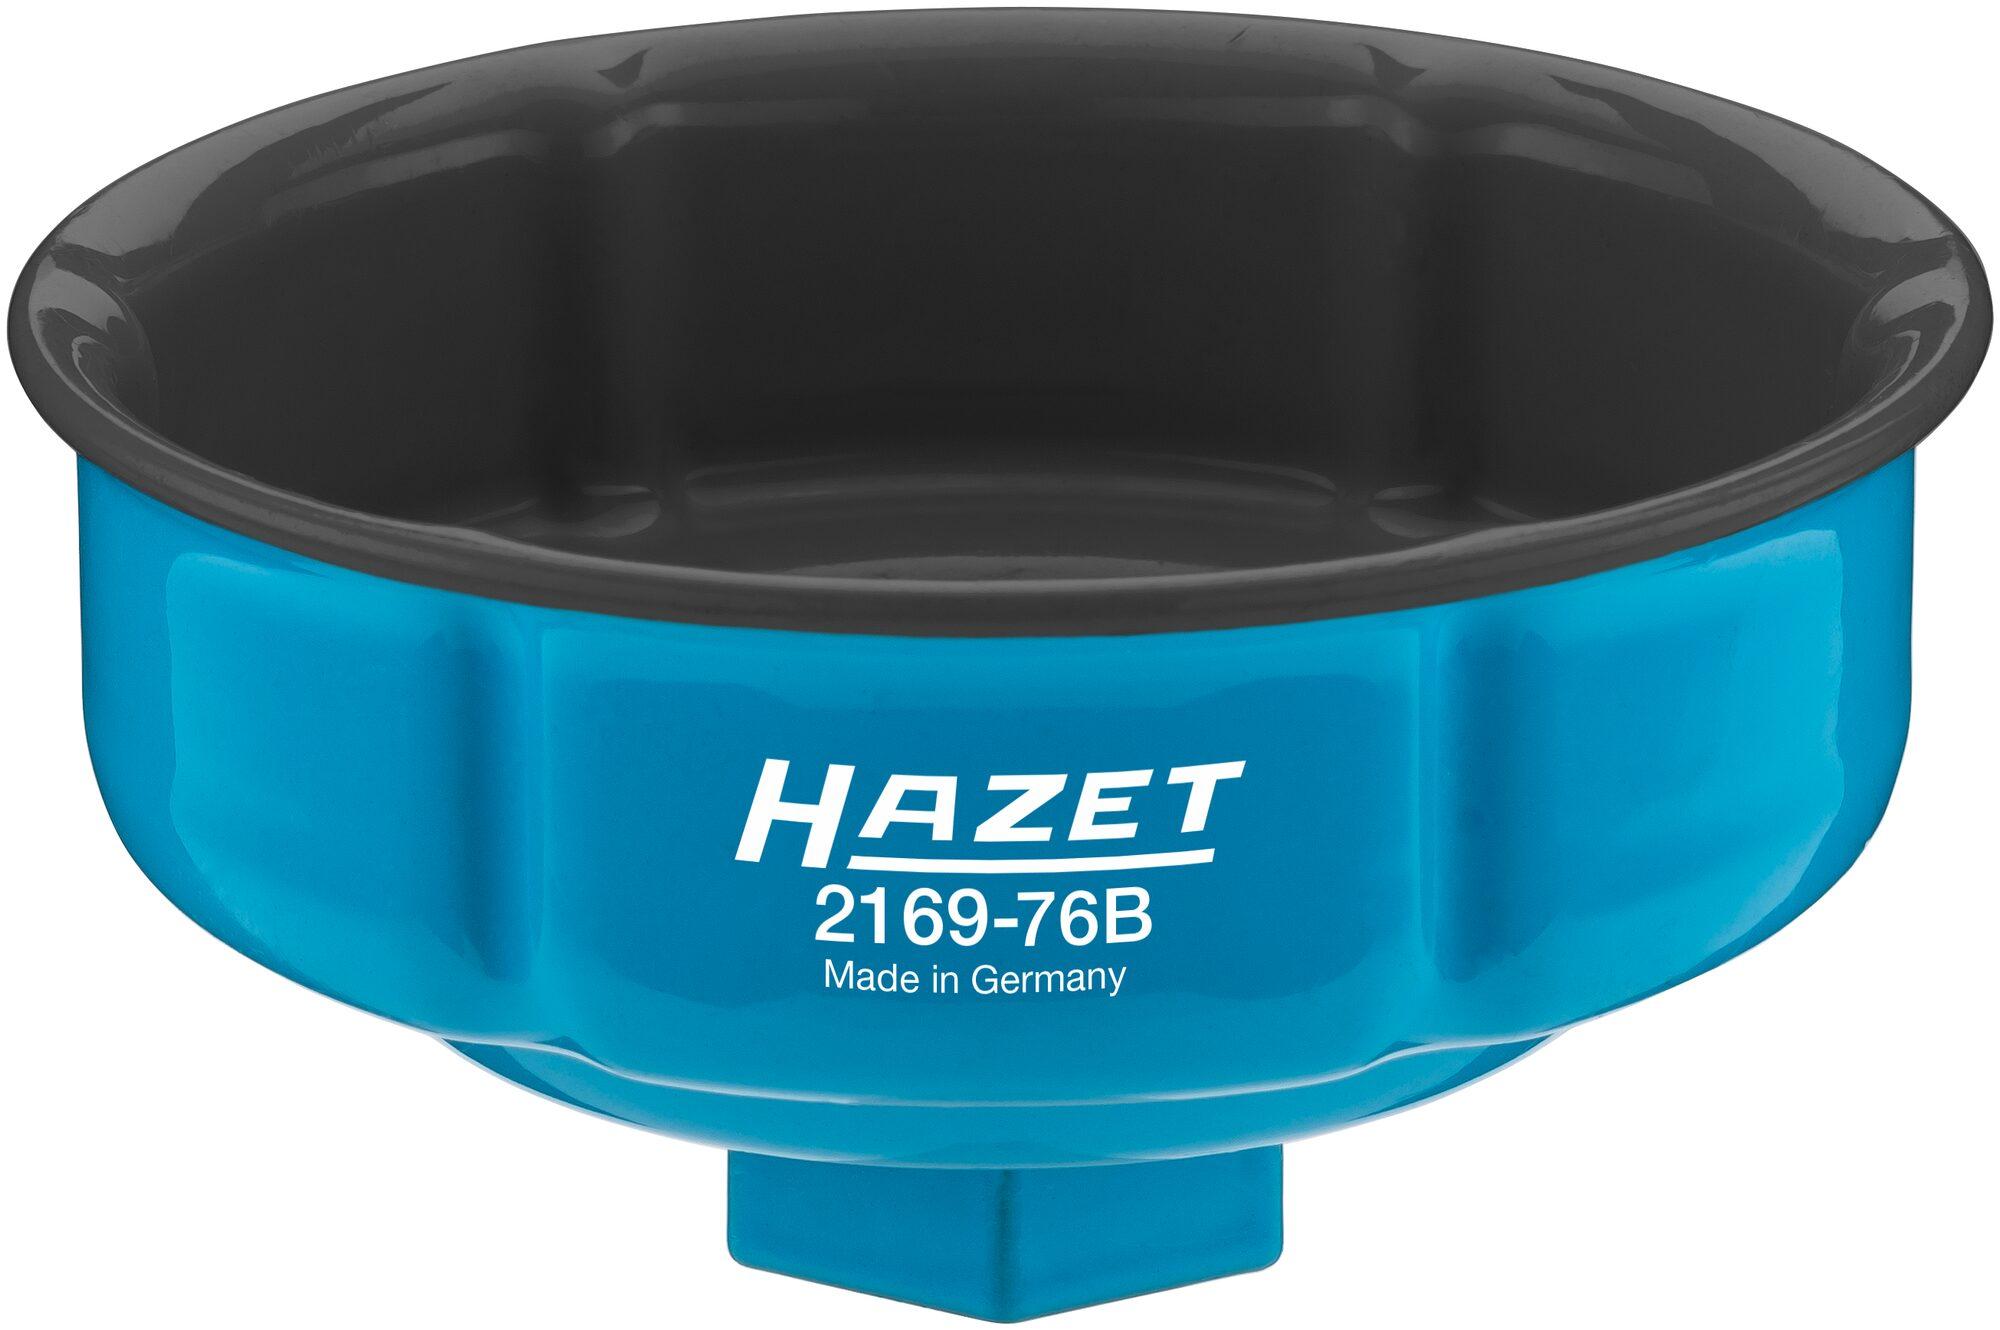 HAZET Ölfilter-Schlüssel 2169-76B ∙ Vierkant hohl 12,5 mm (1/2 Zoll) ∙ Rillenprofil ∙ 85.6 mm